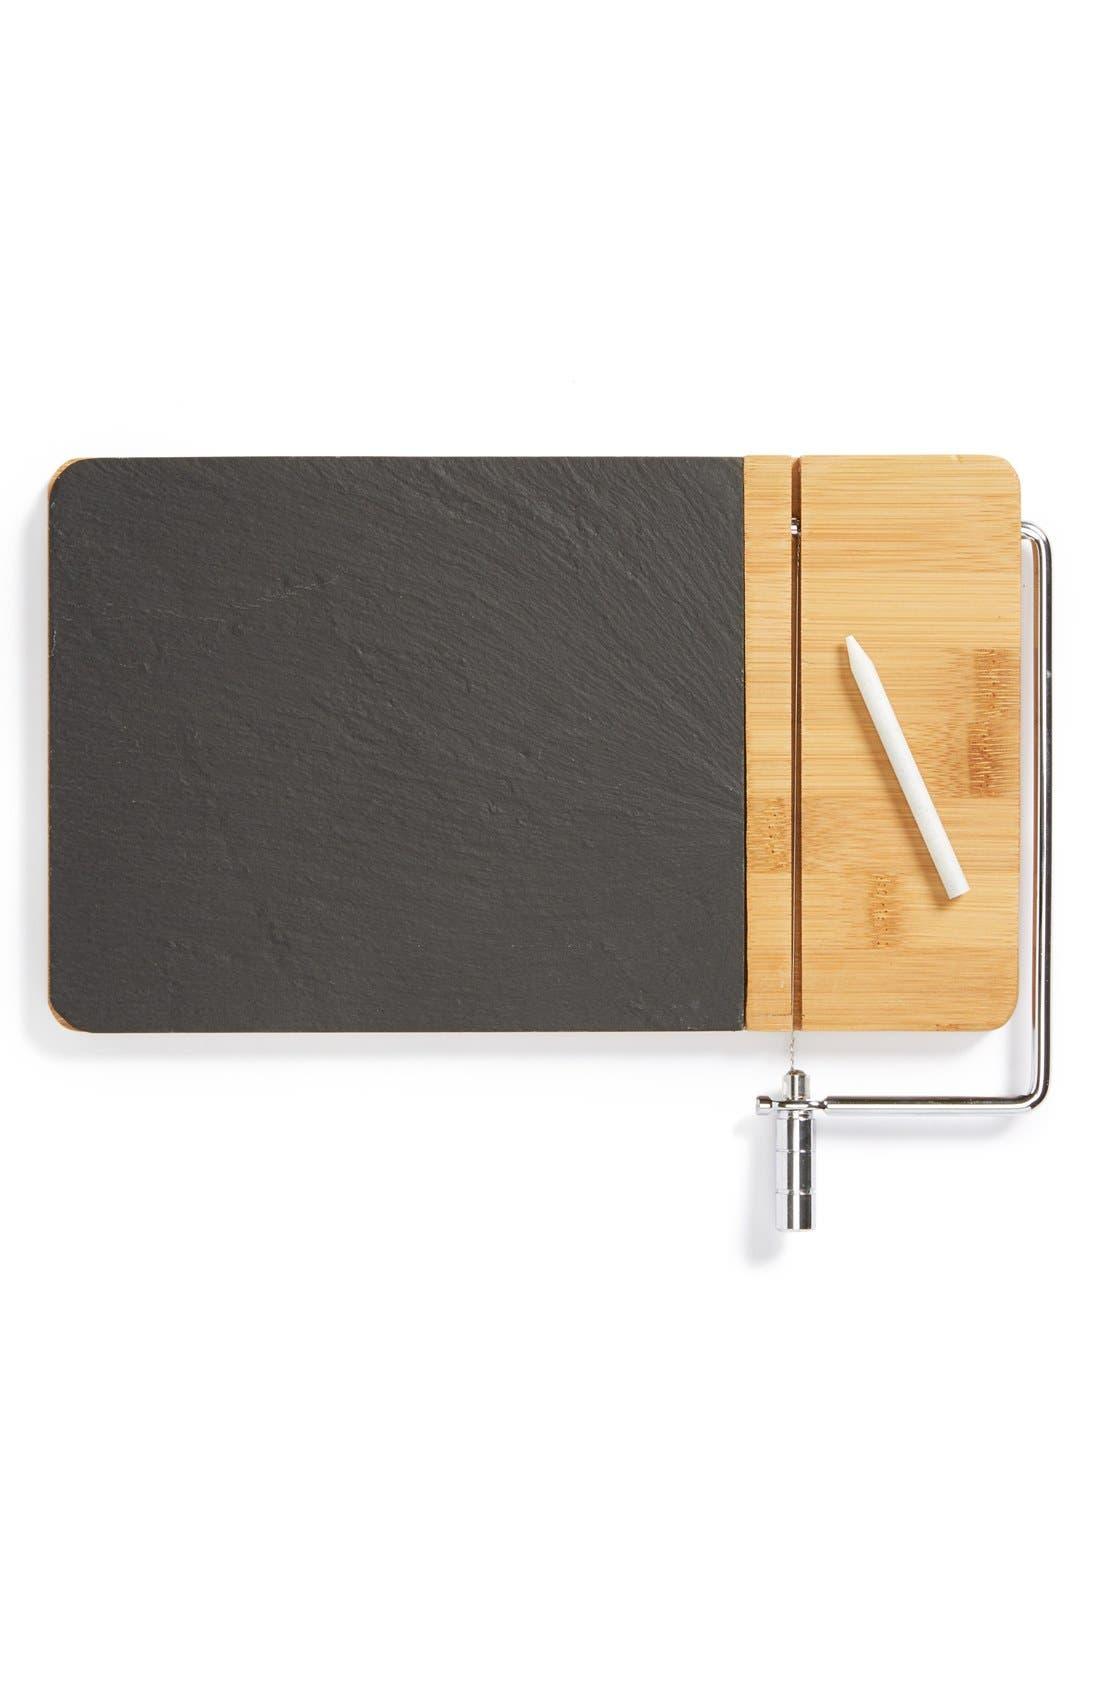 Alternate Image 1 Selected - Core Home Slate & Bamboo Cheese Board